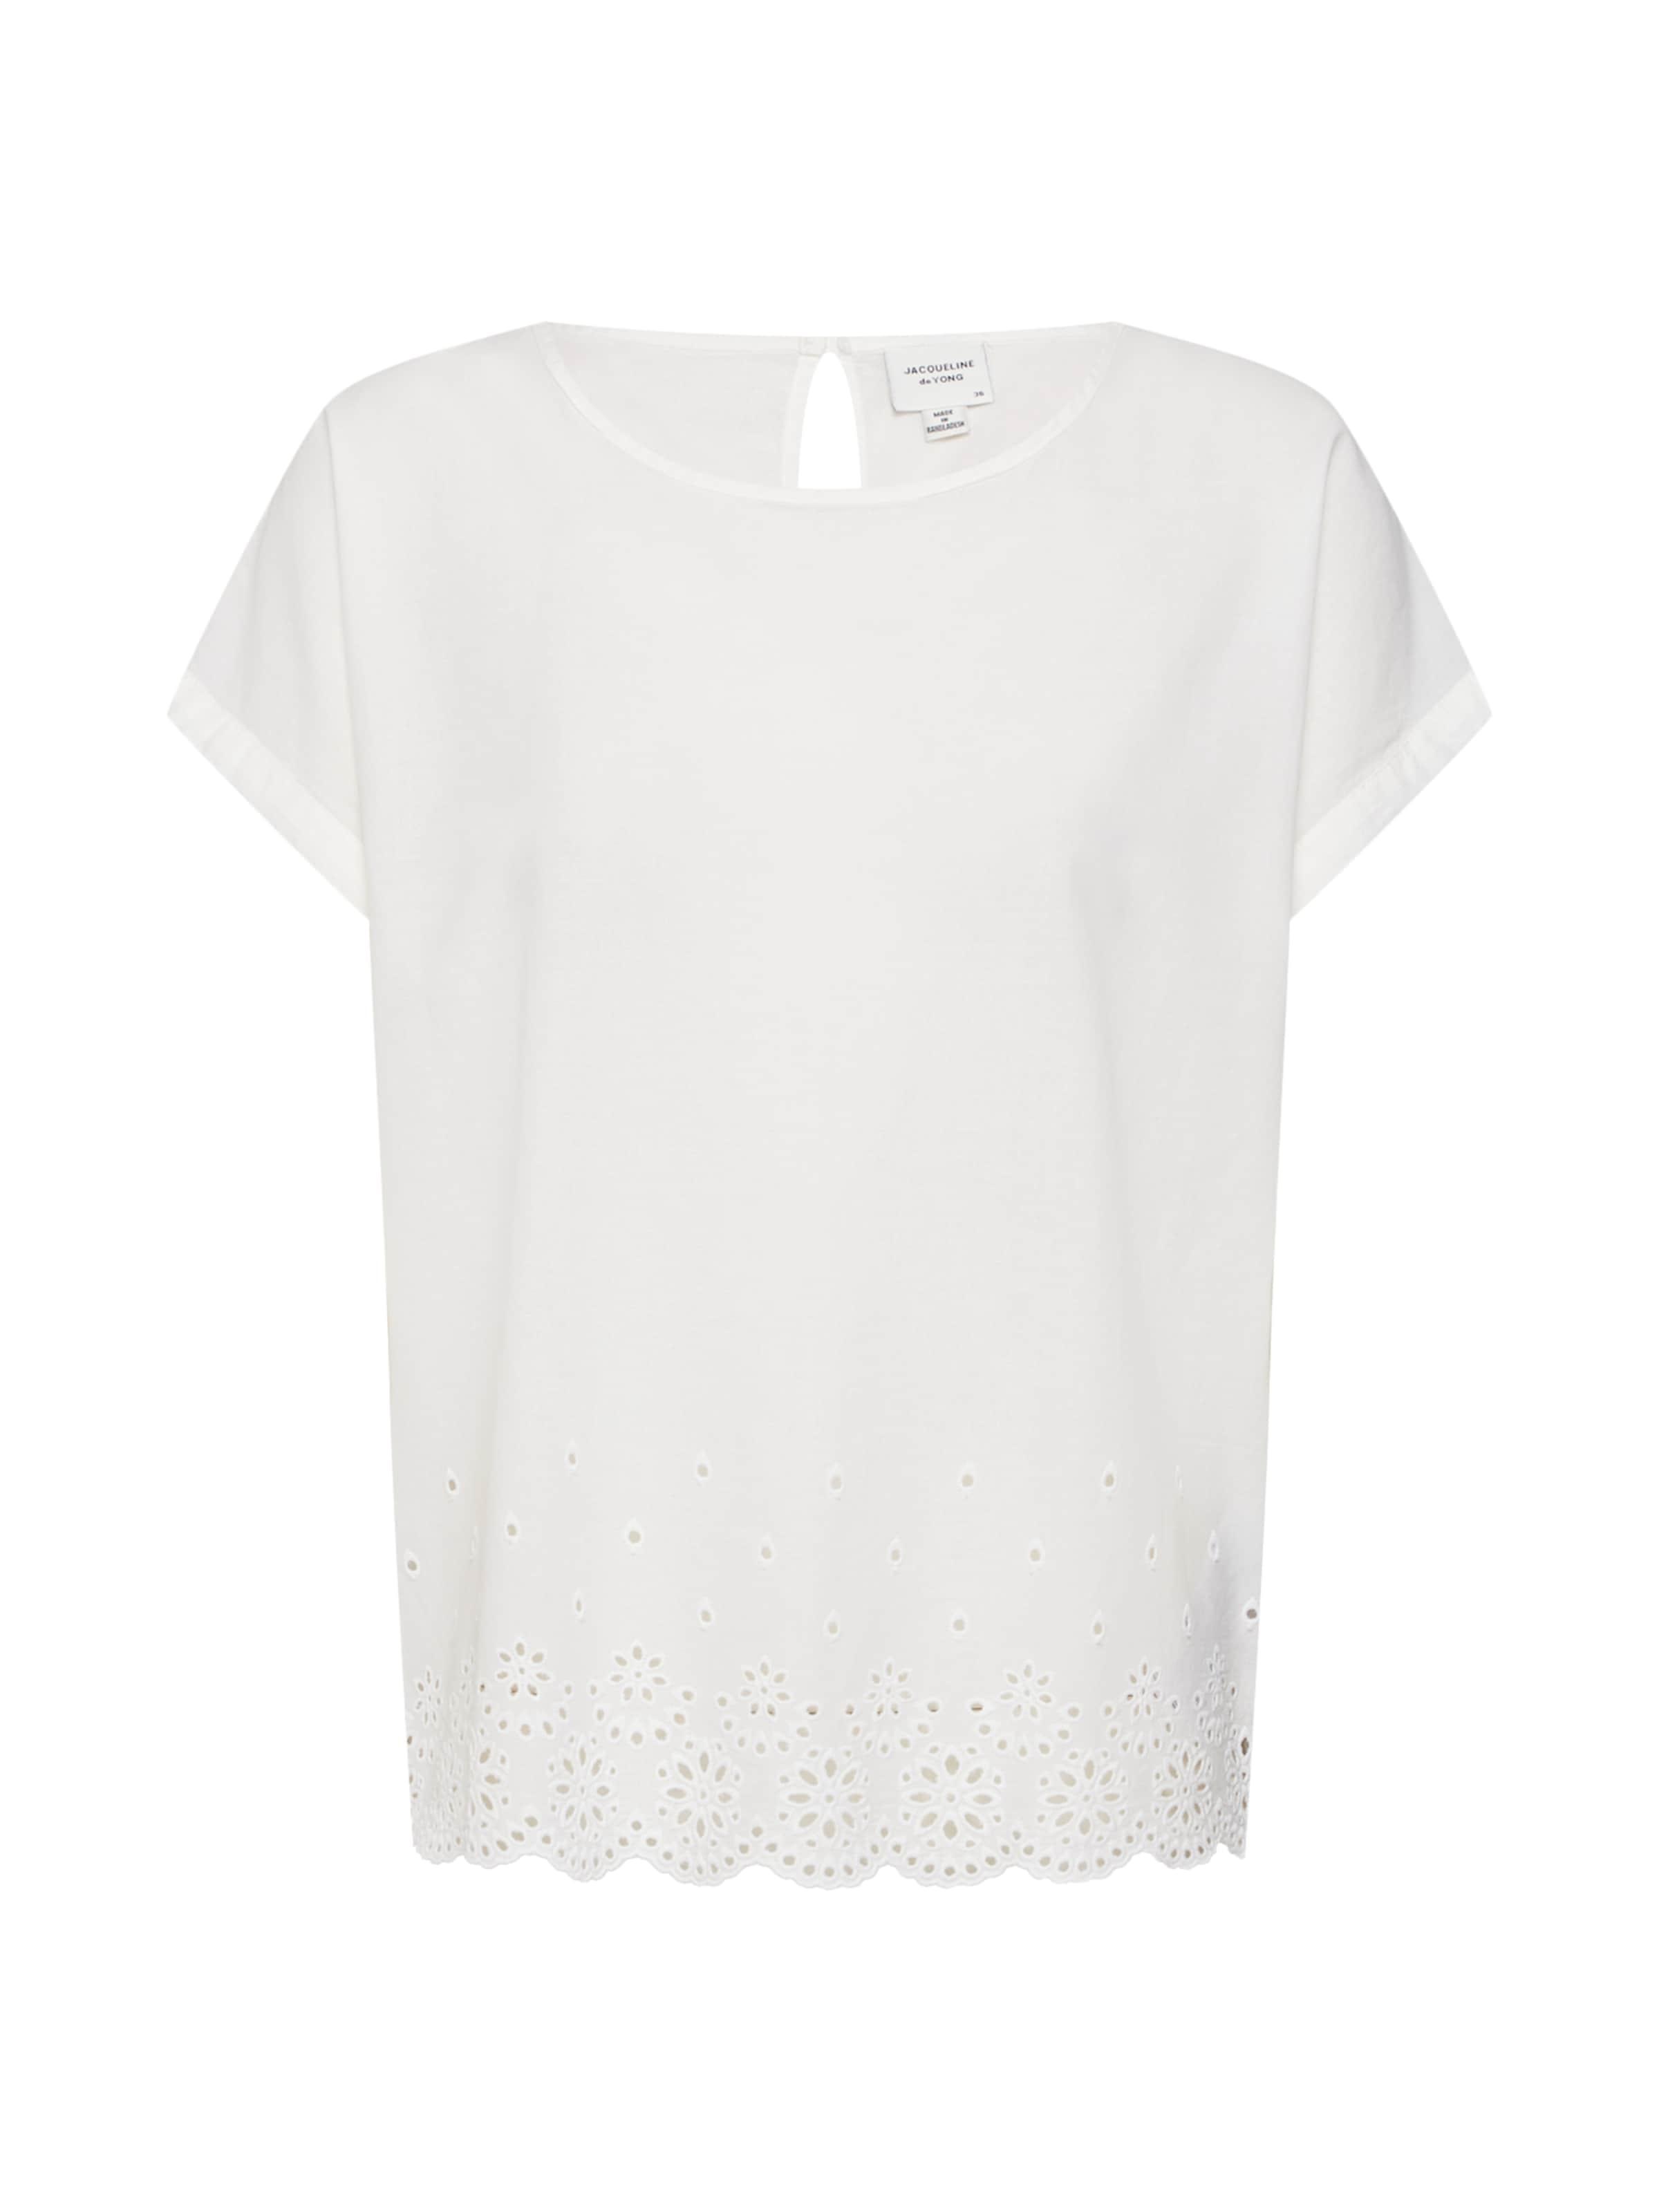 Natuurwit In Jacqueline Yong 'jdyjules s De Wvn' S Top Shirt qGVSpMUz